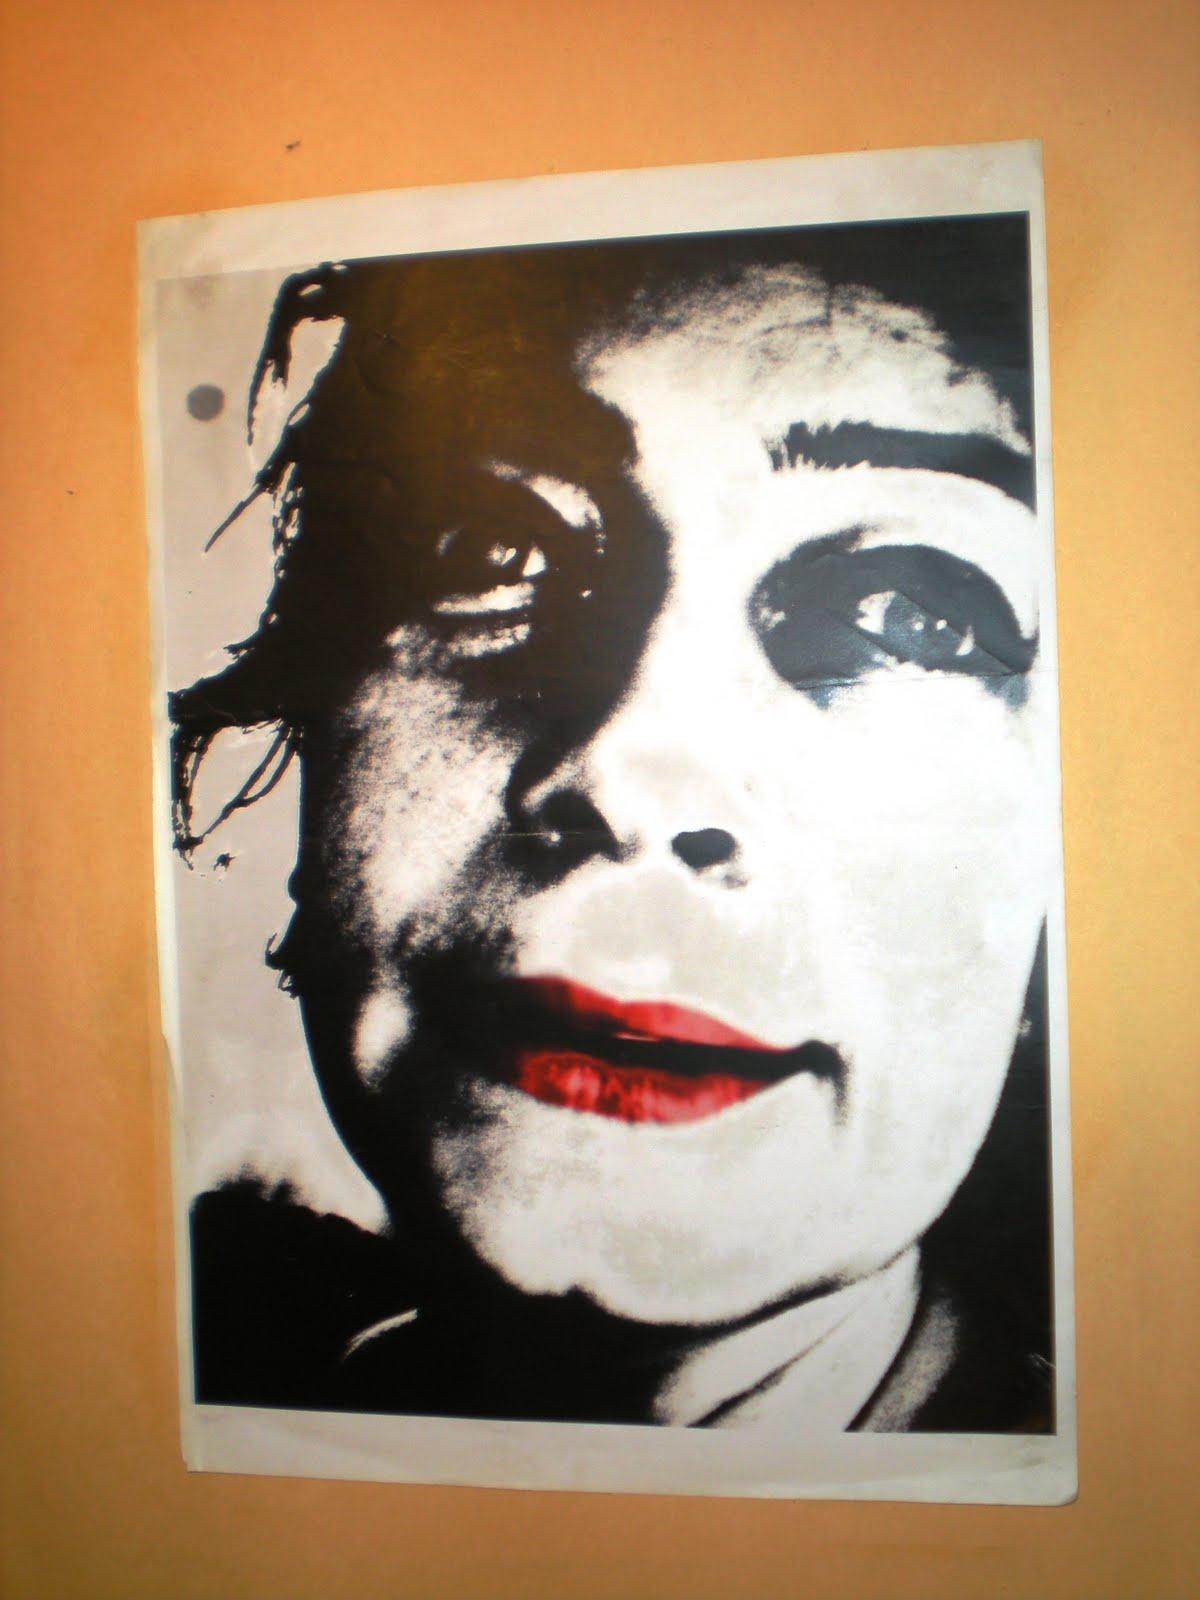 Avril Lavigne Wallpapers: Ece Wallpaper